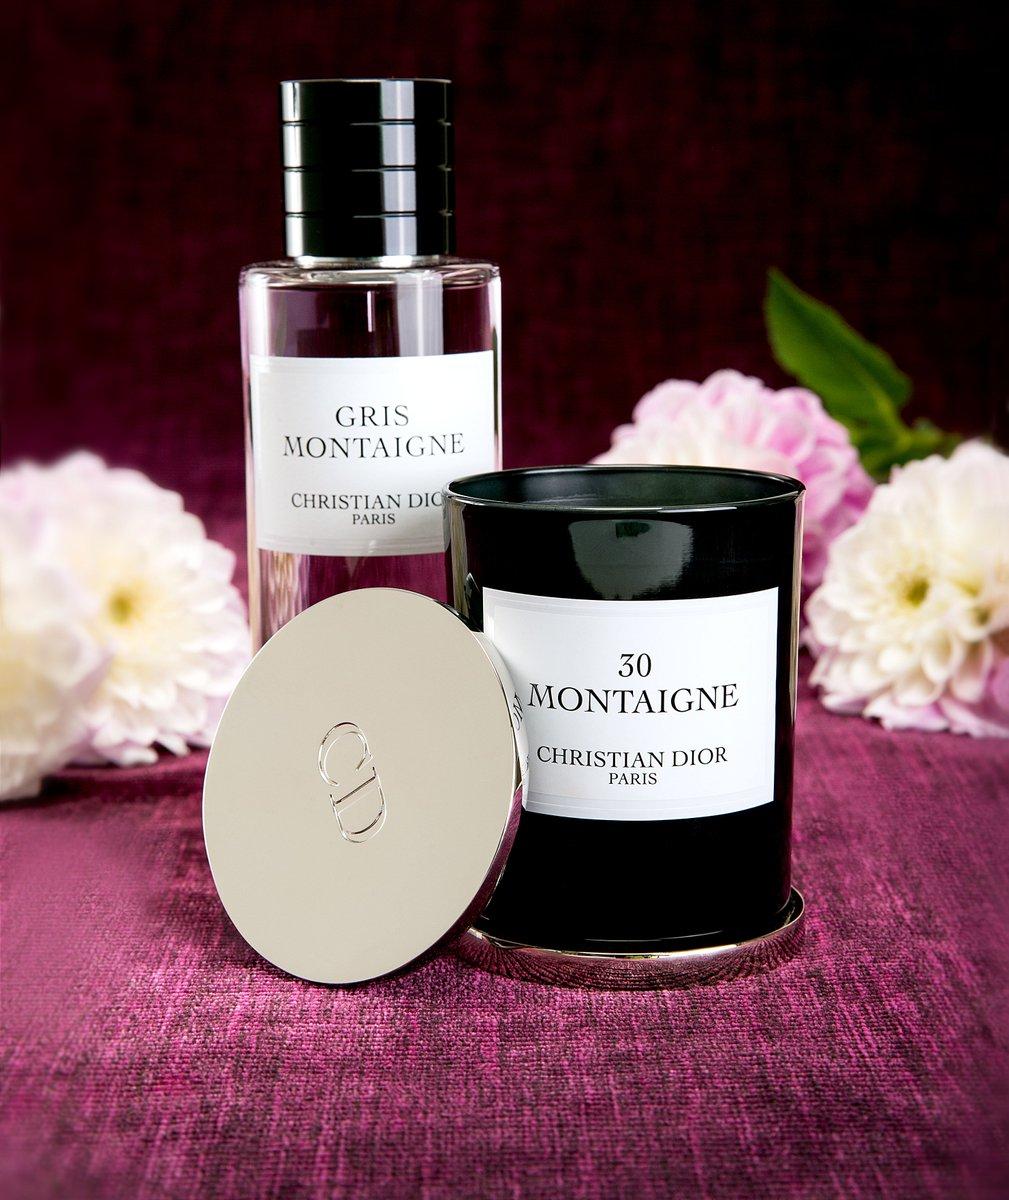 "Gris Montaigne Christian Dior fenwick on twitter: ""part of la collection privée christian"